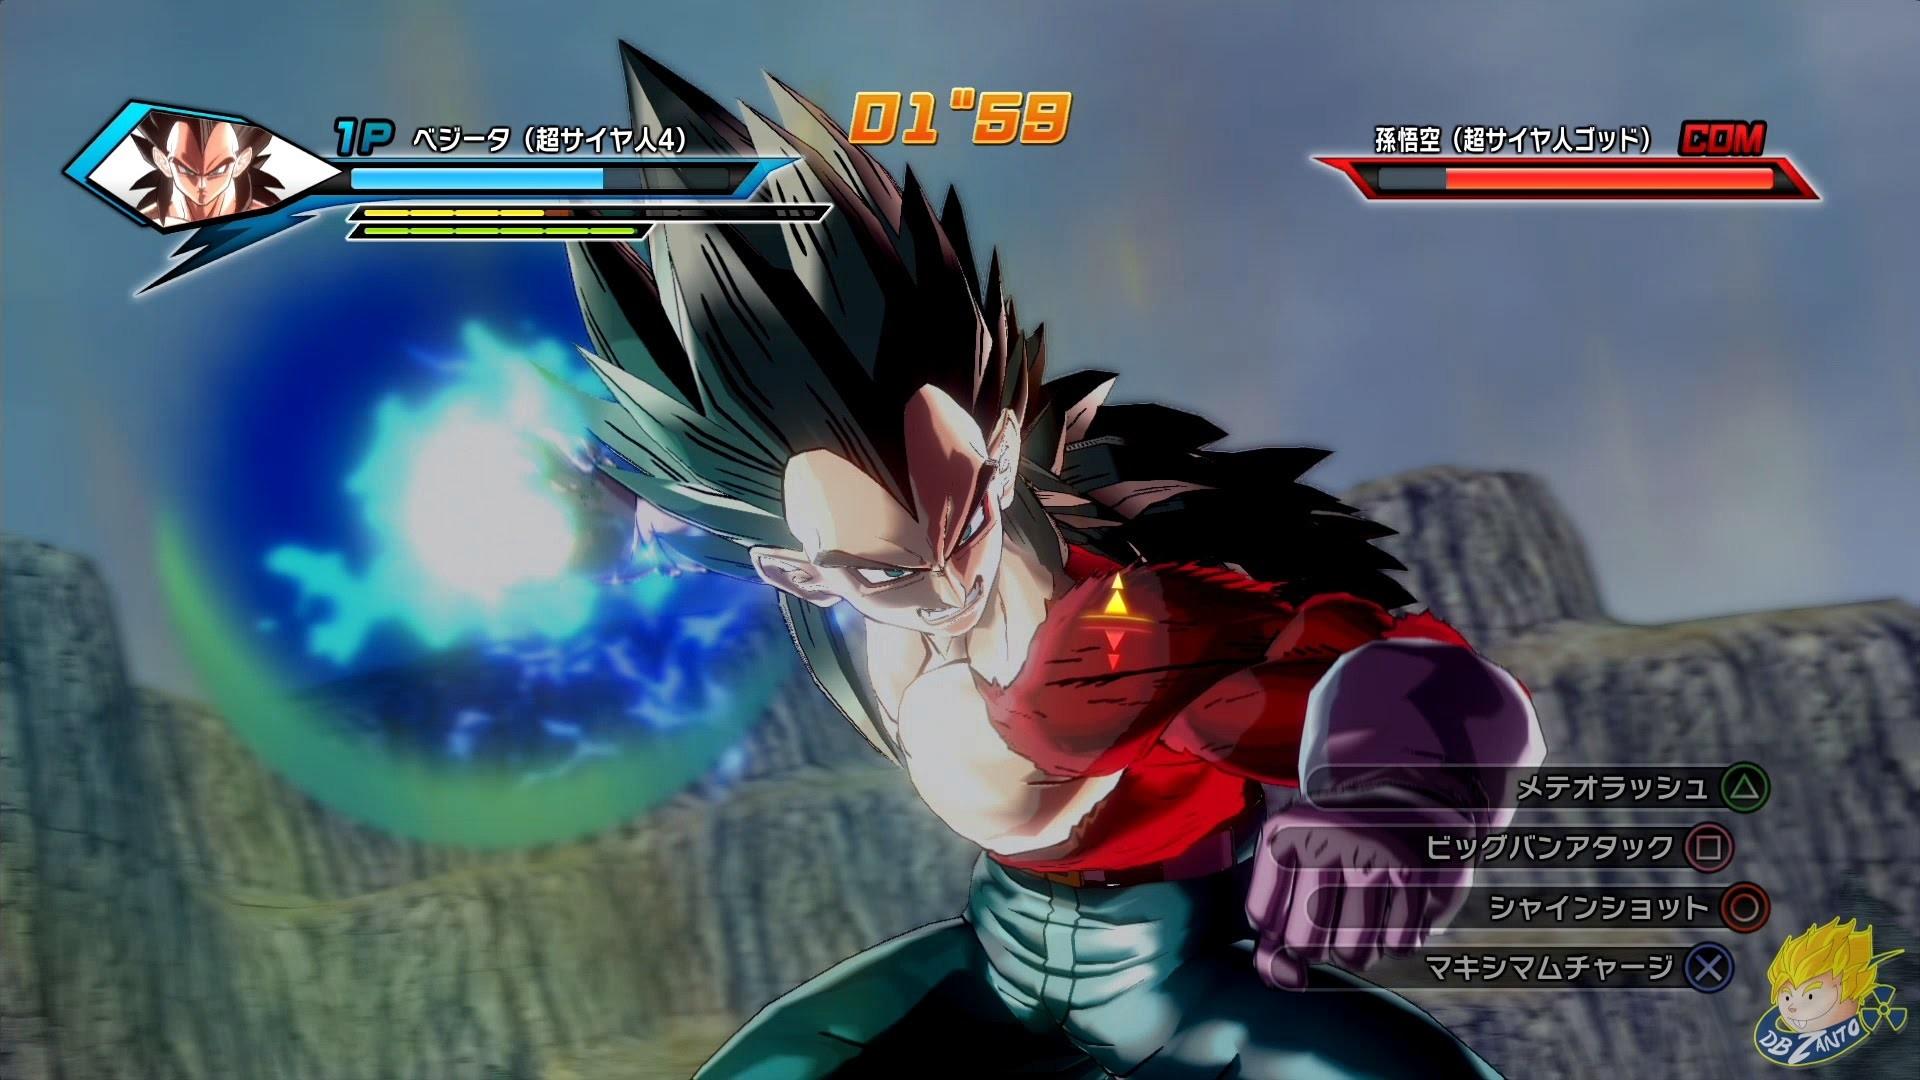 Dragon Ball Xenoverse (PS4): SSJ4 Vegeta [DLC] Vs Super Saiyan God Goku  (TIMEOUT)【60FPS 1080P】 – YouTube